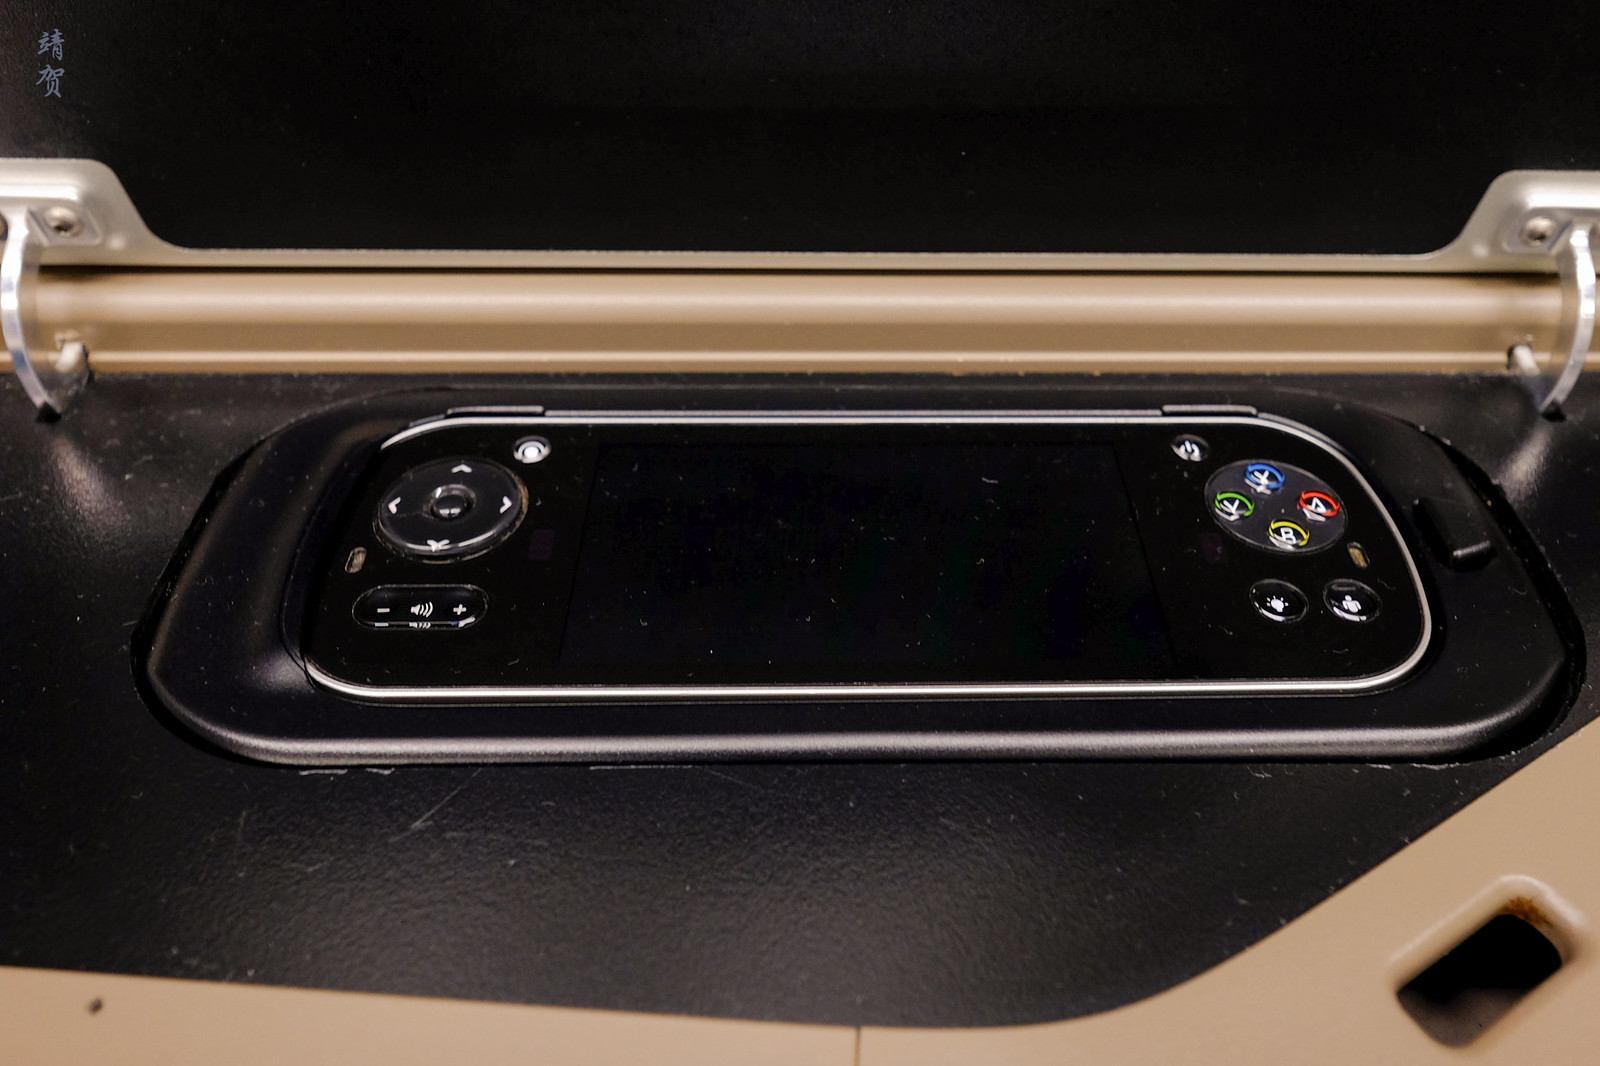 Inflight entertainment controls